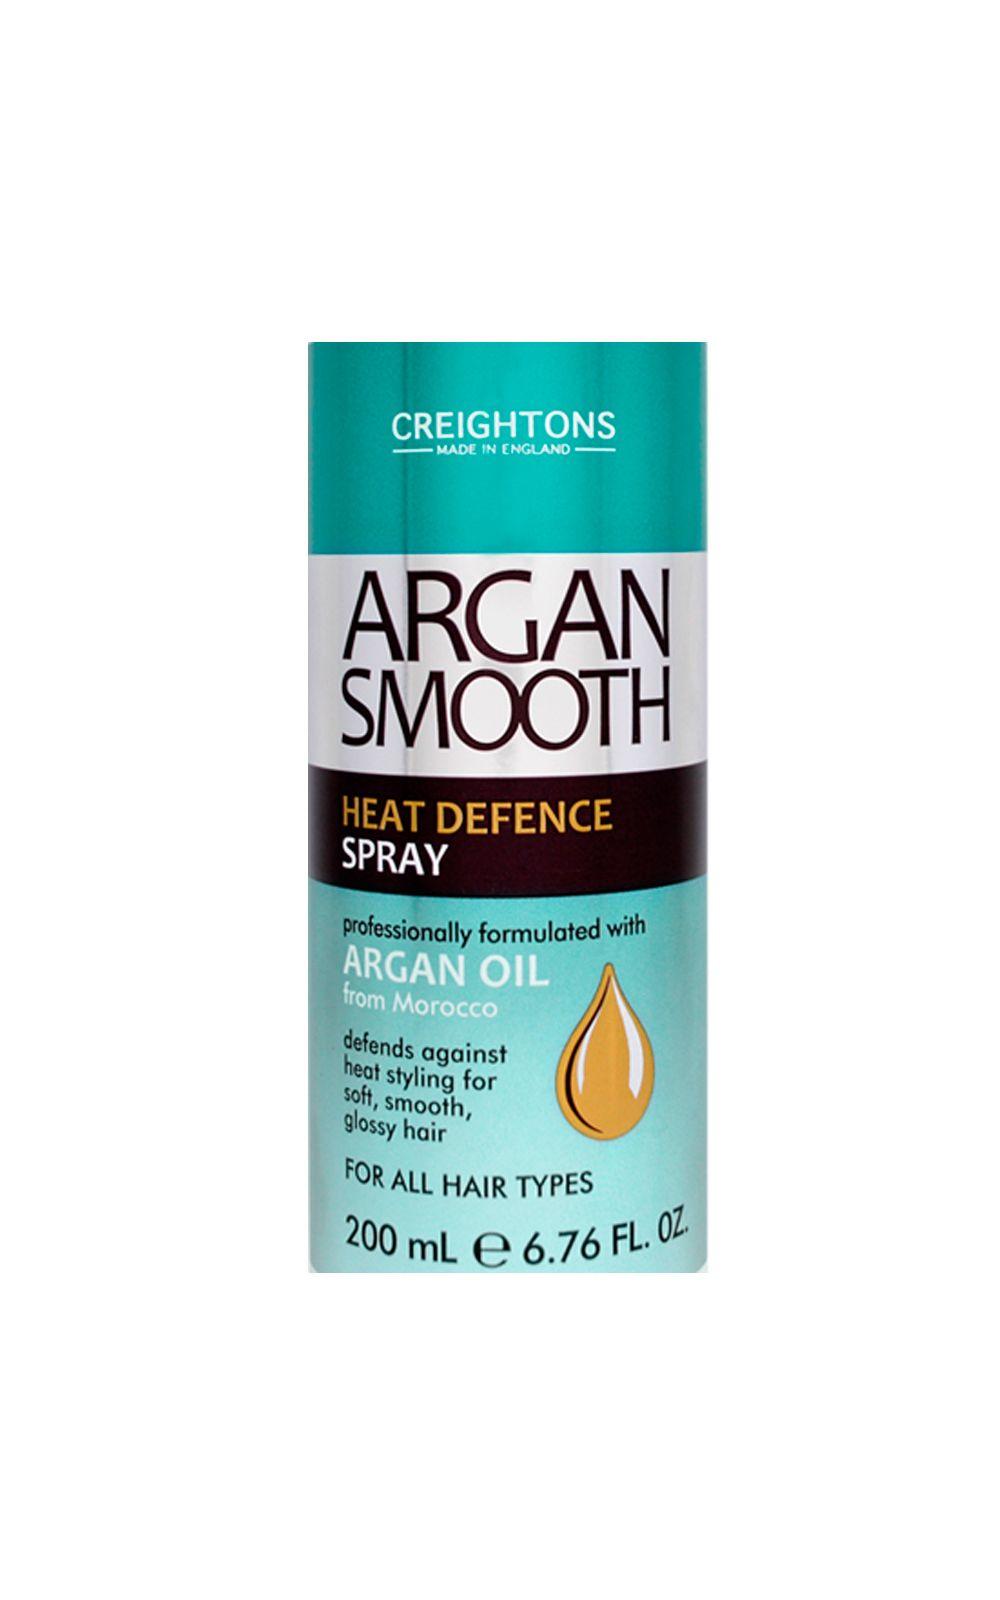 Foto 2 - Creightons Argan Smooth Heat Defence Spray - Protetor Térmico - 200ml